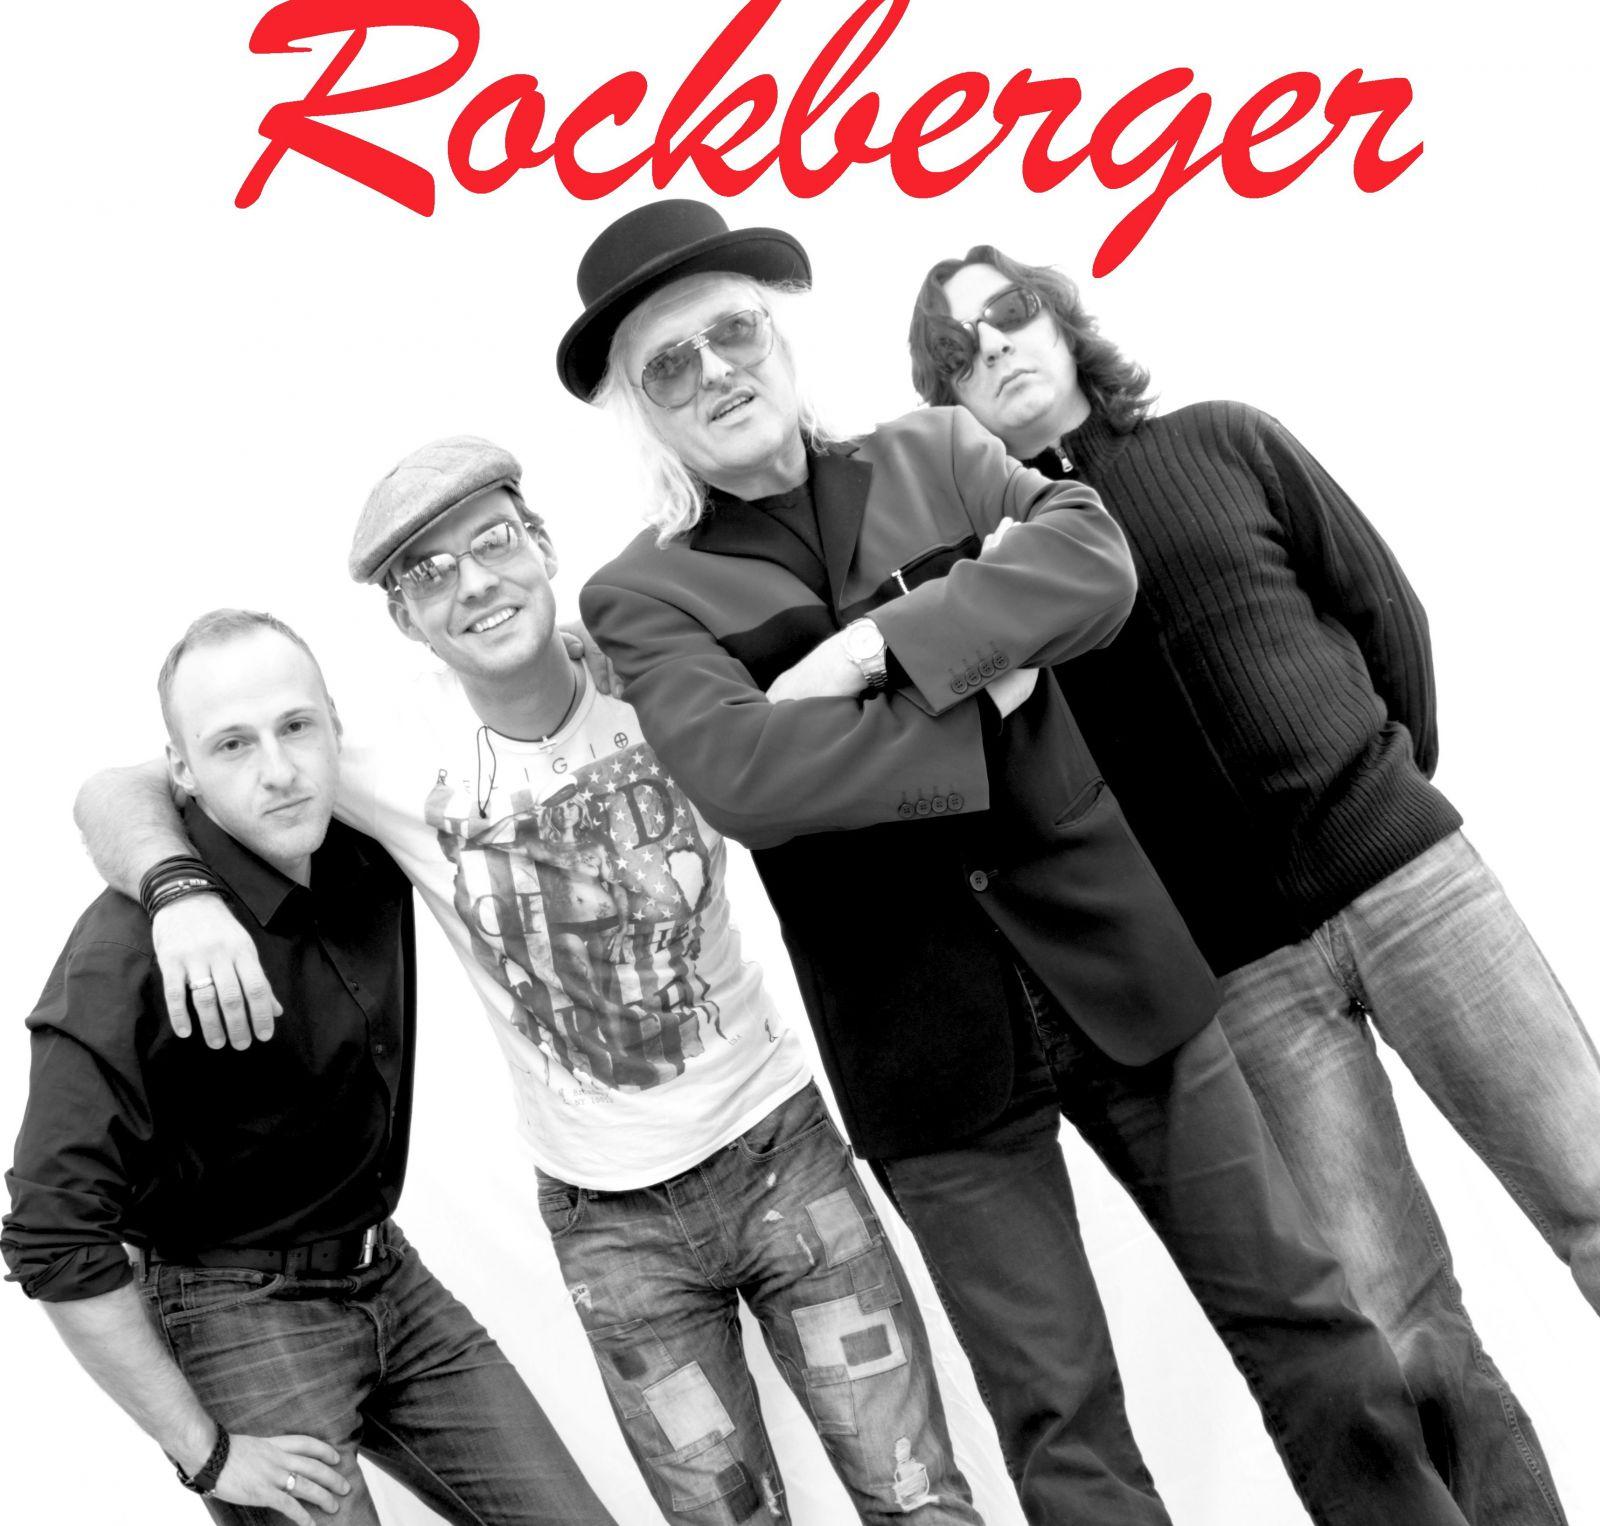 Rockberger_ASB 3